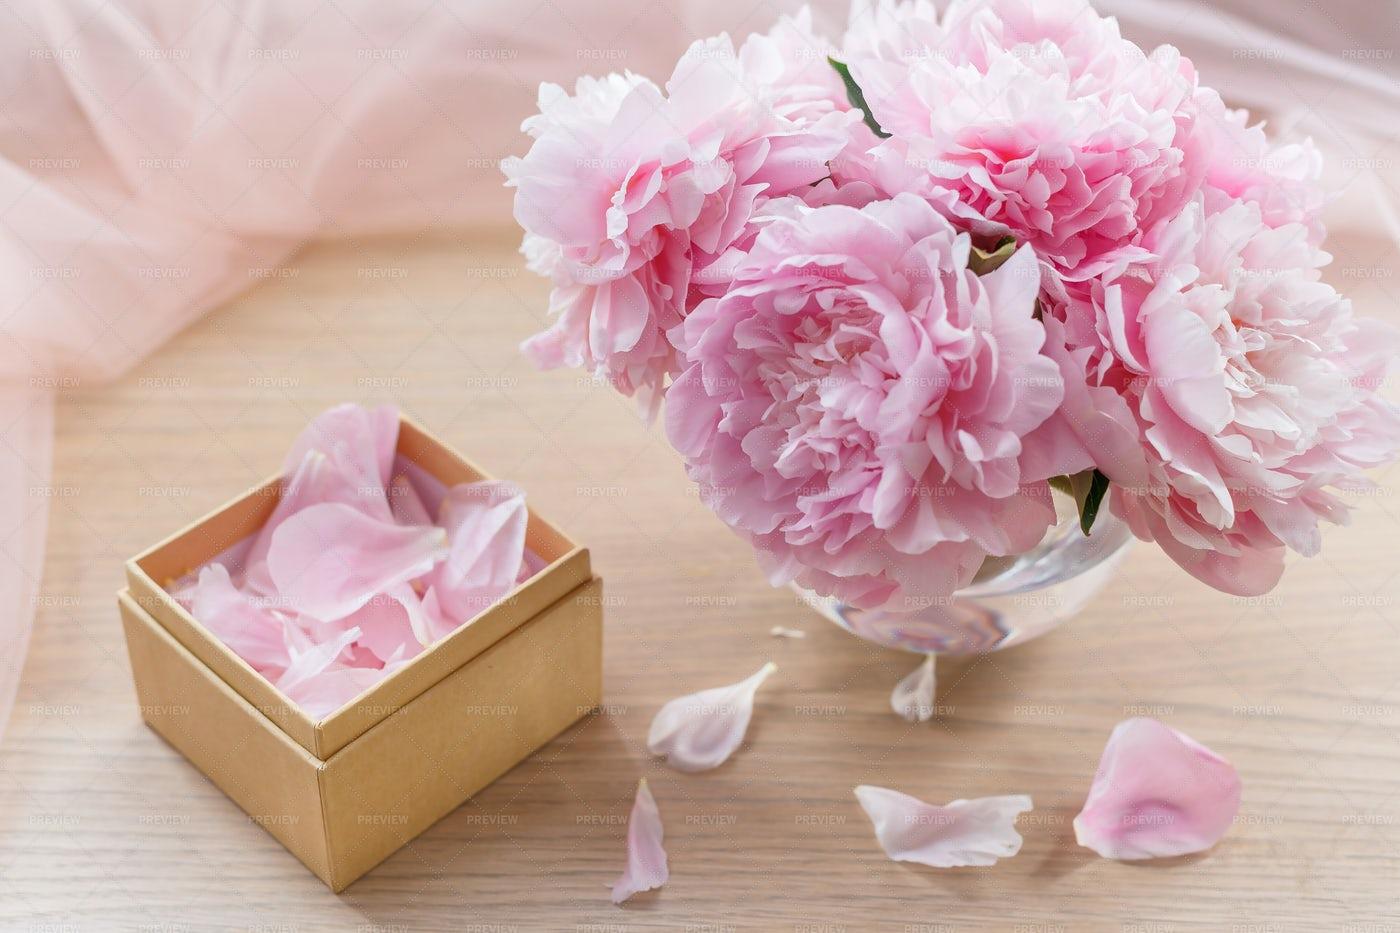 Peony Flowers And Petals: Stock Photos